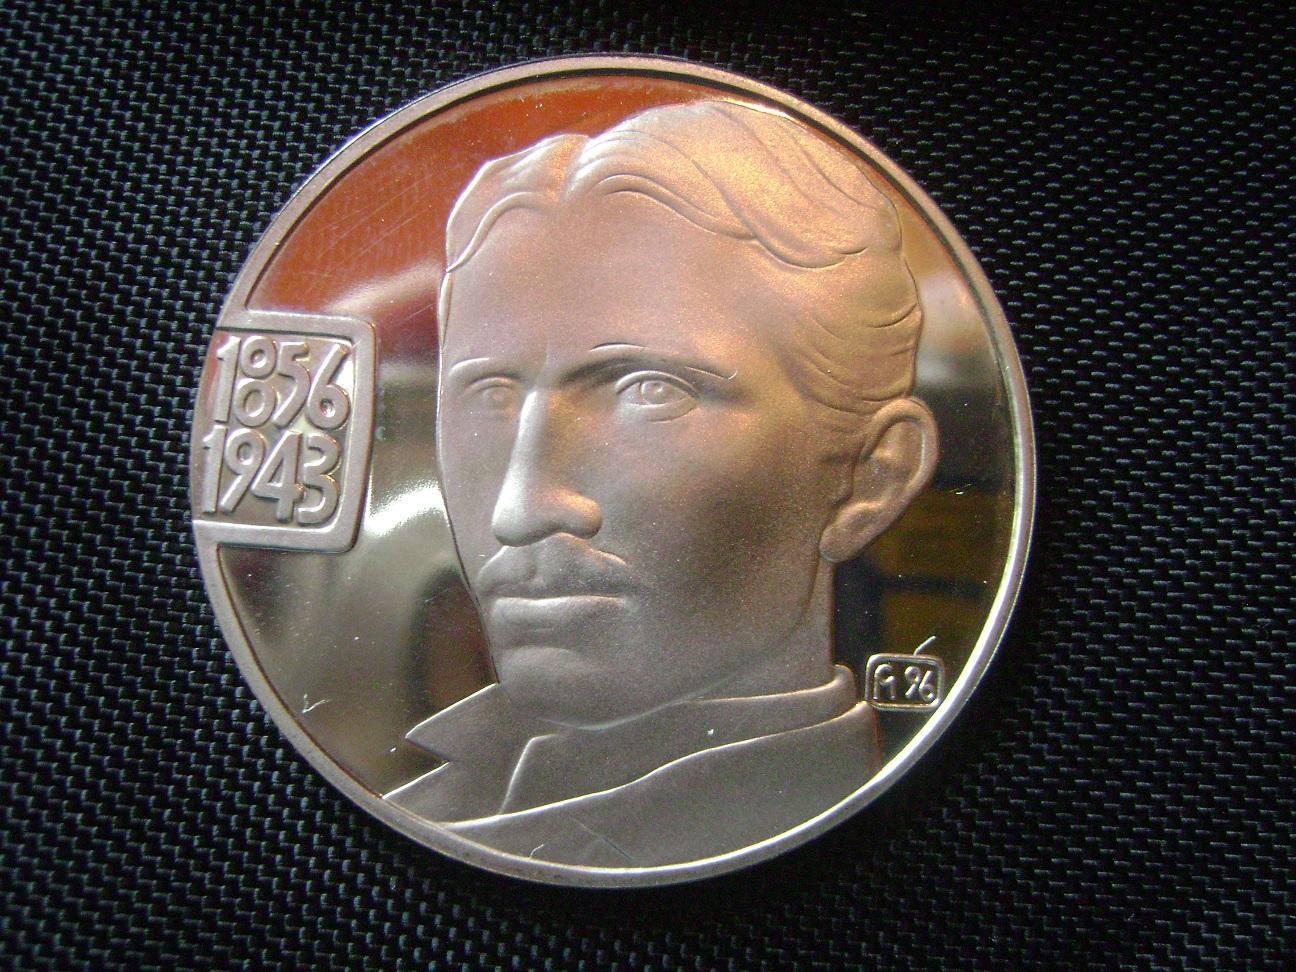 Nikola_Tesla_Treci_Milenijum_1996_1.JPG